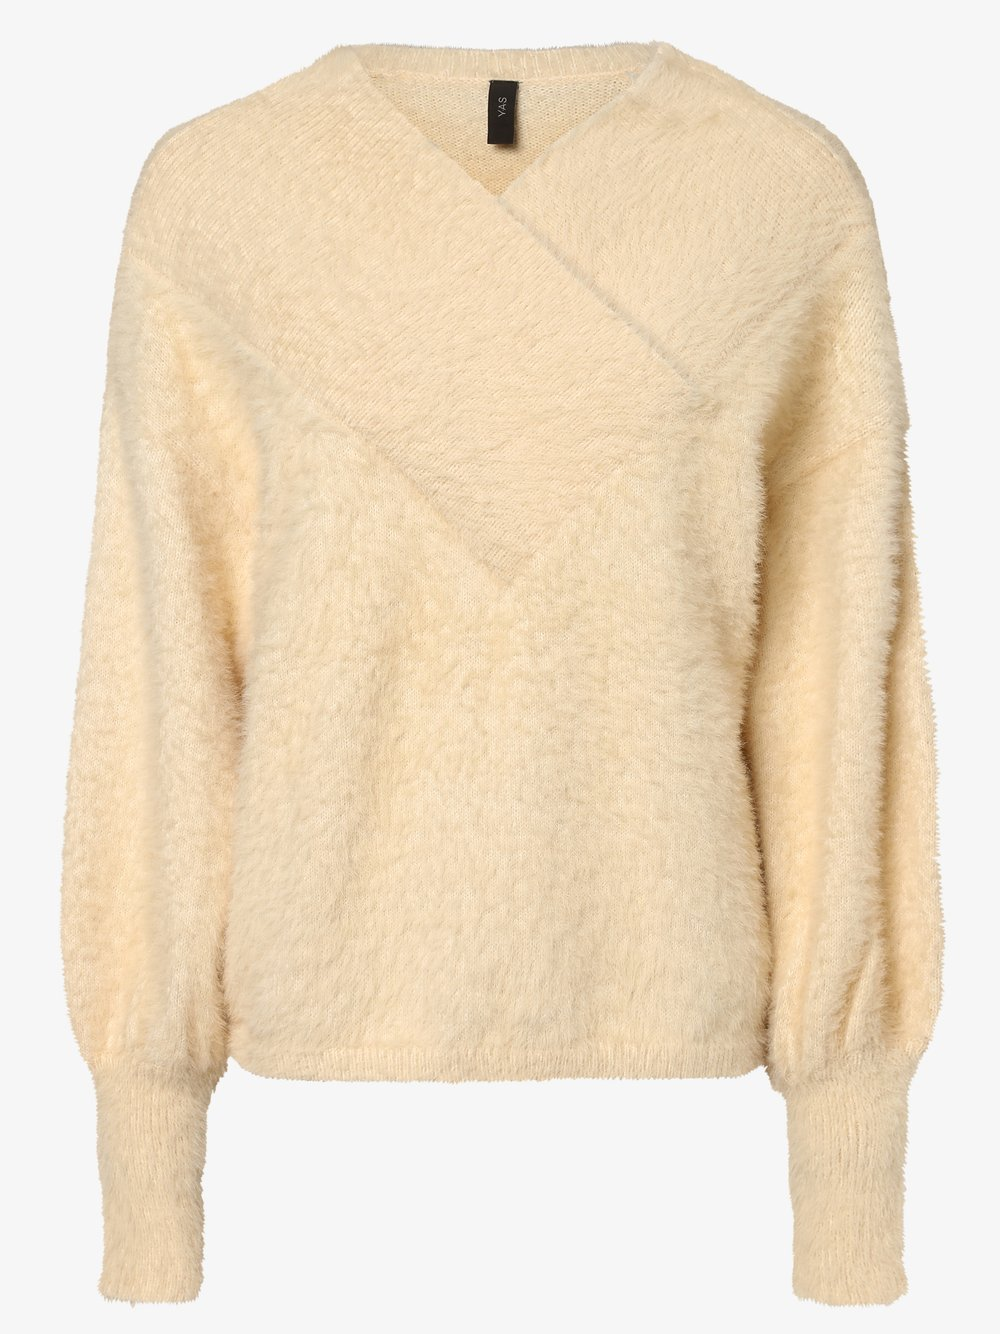 Y.A.S - Sweter damski – Yasfleur, biały